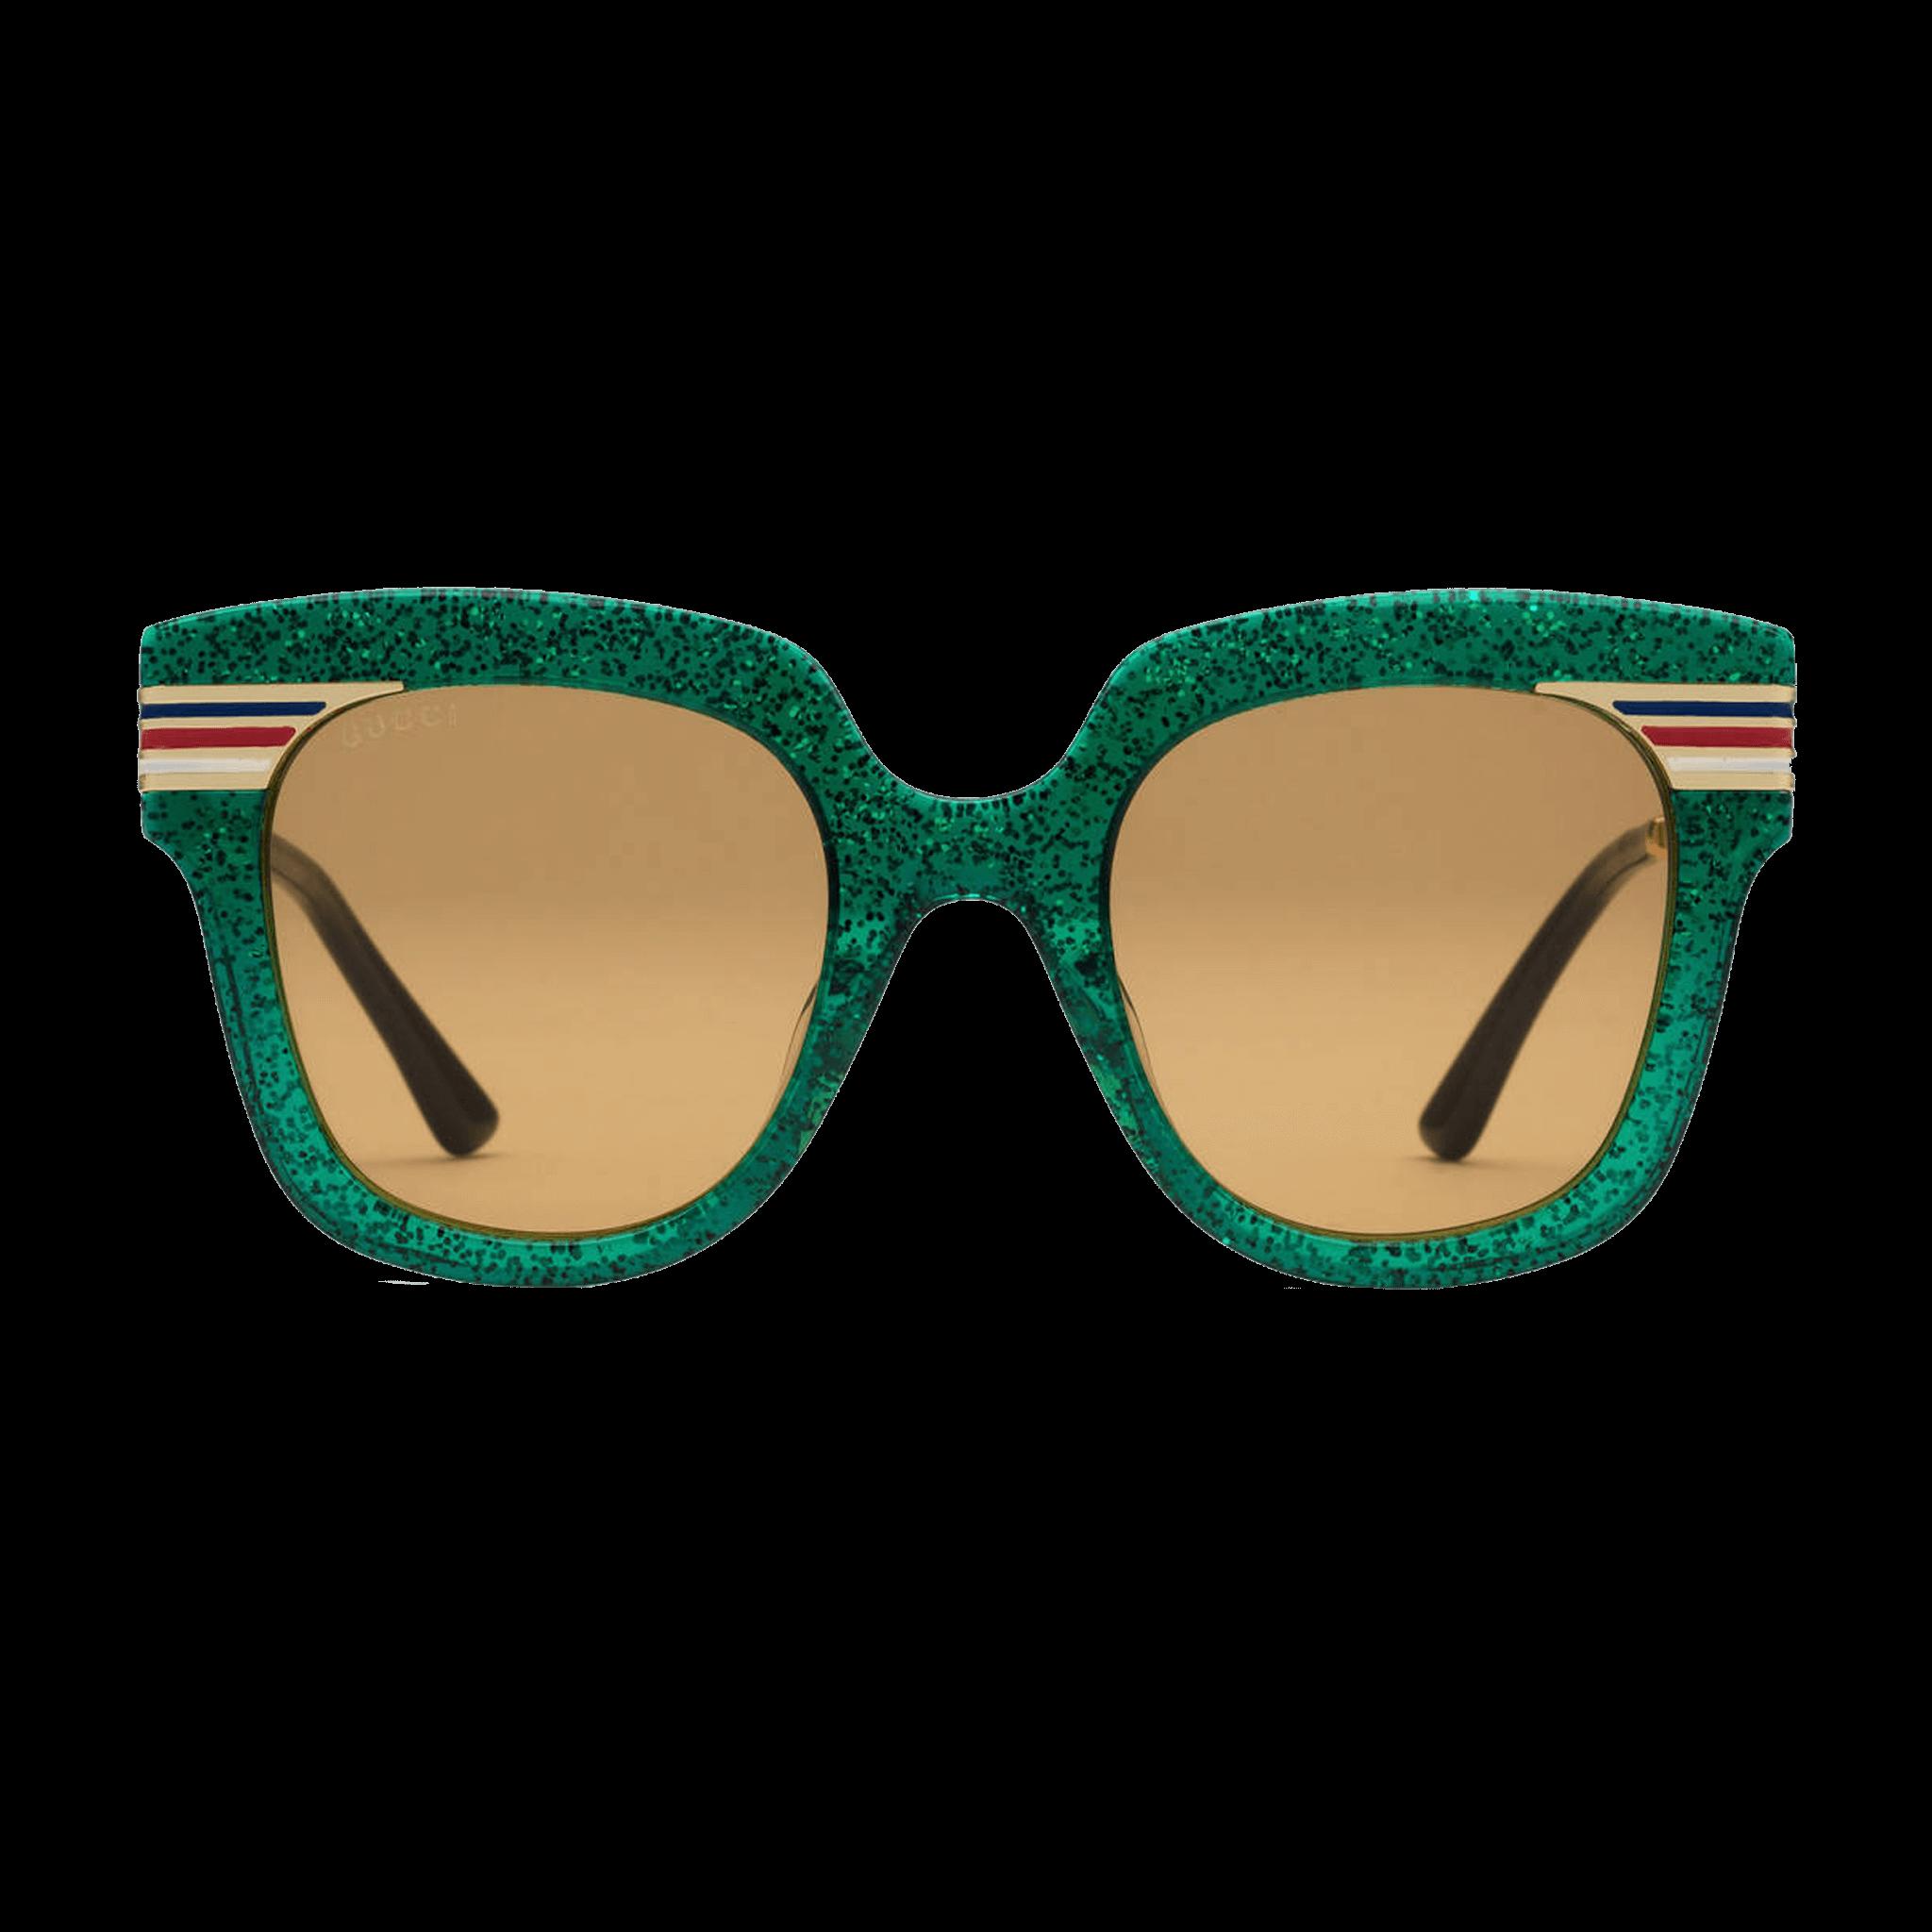 b047ead165a Square-frame glitter acetate sunglasses